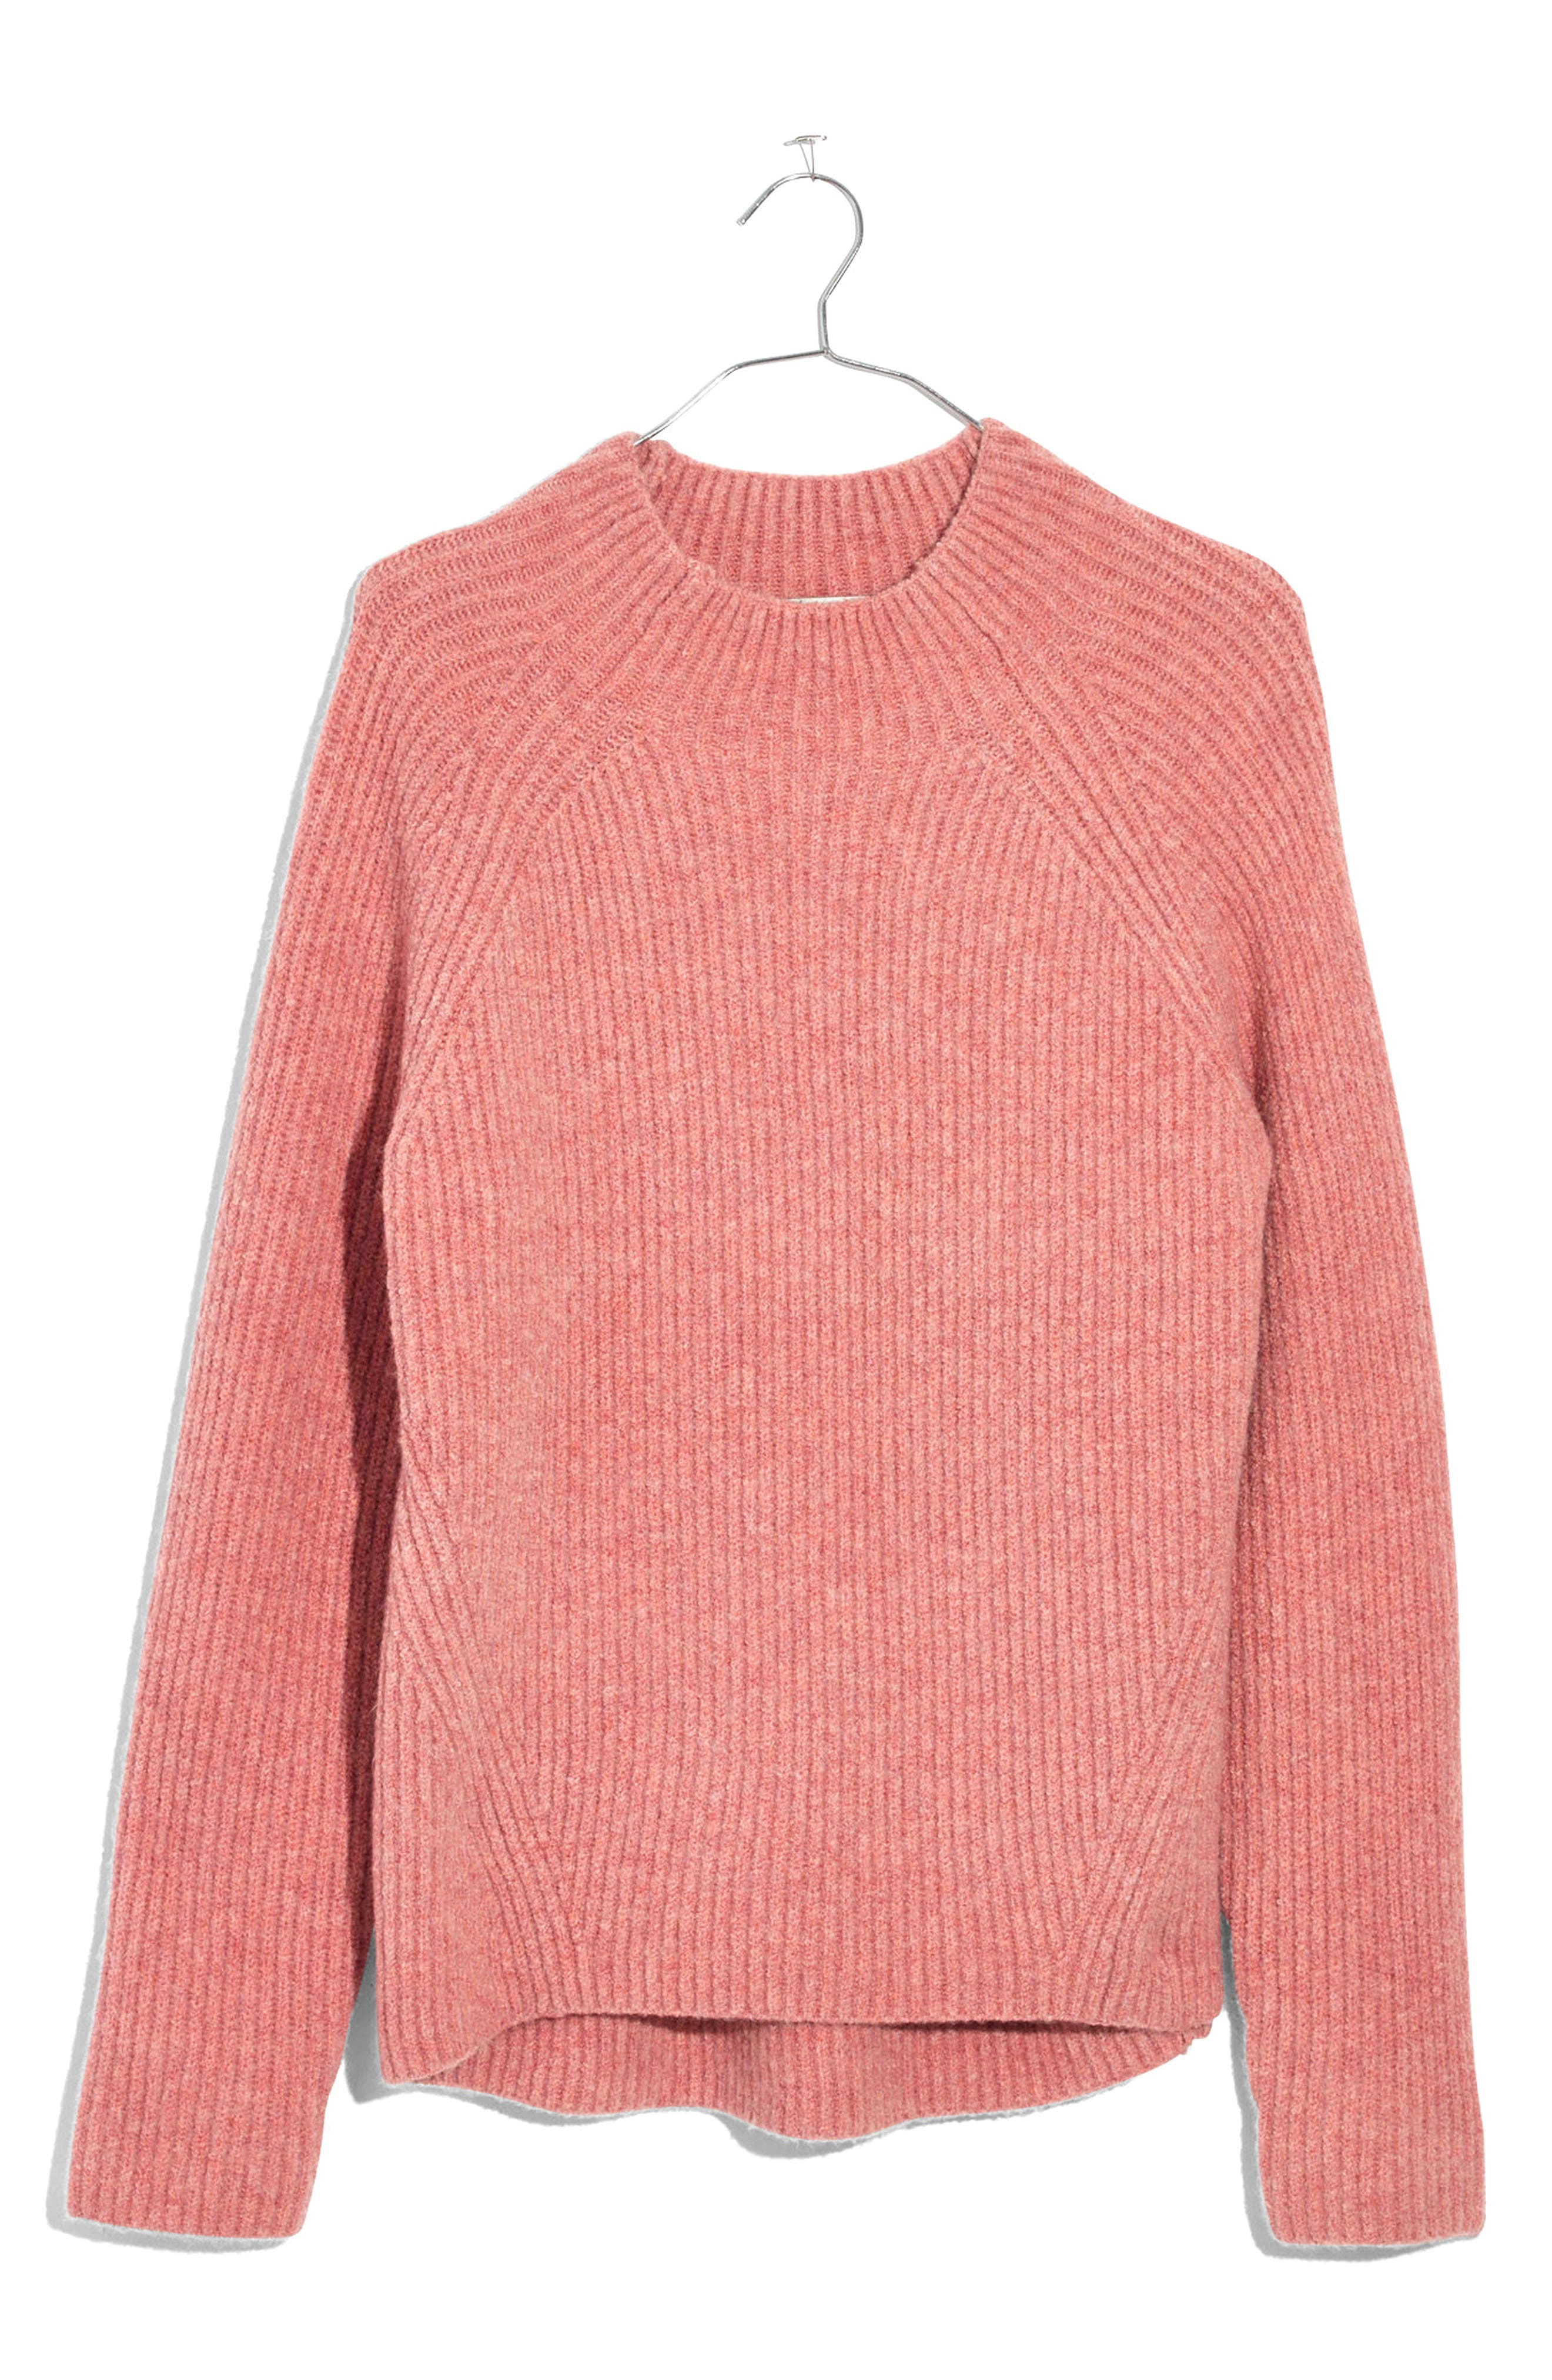 Northfield Mock Neck Sweater,                             Main thumbnail 1, color,                             Heather Poinsettia